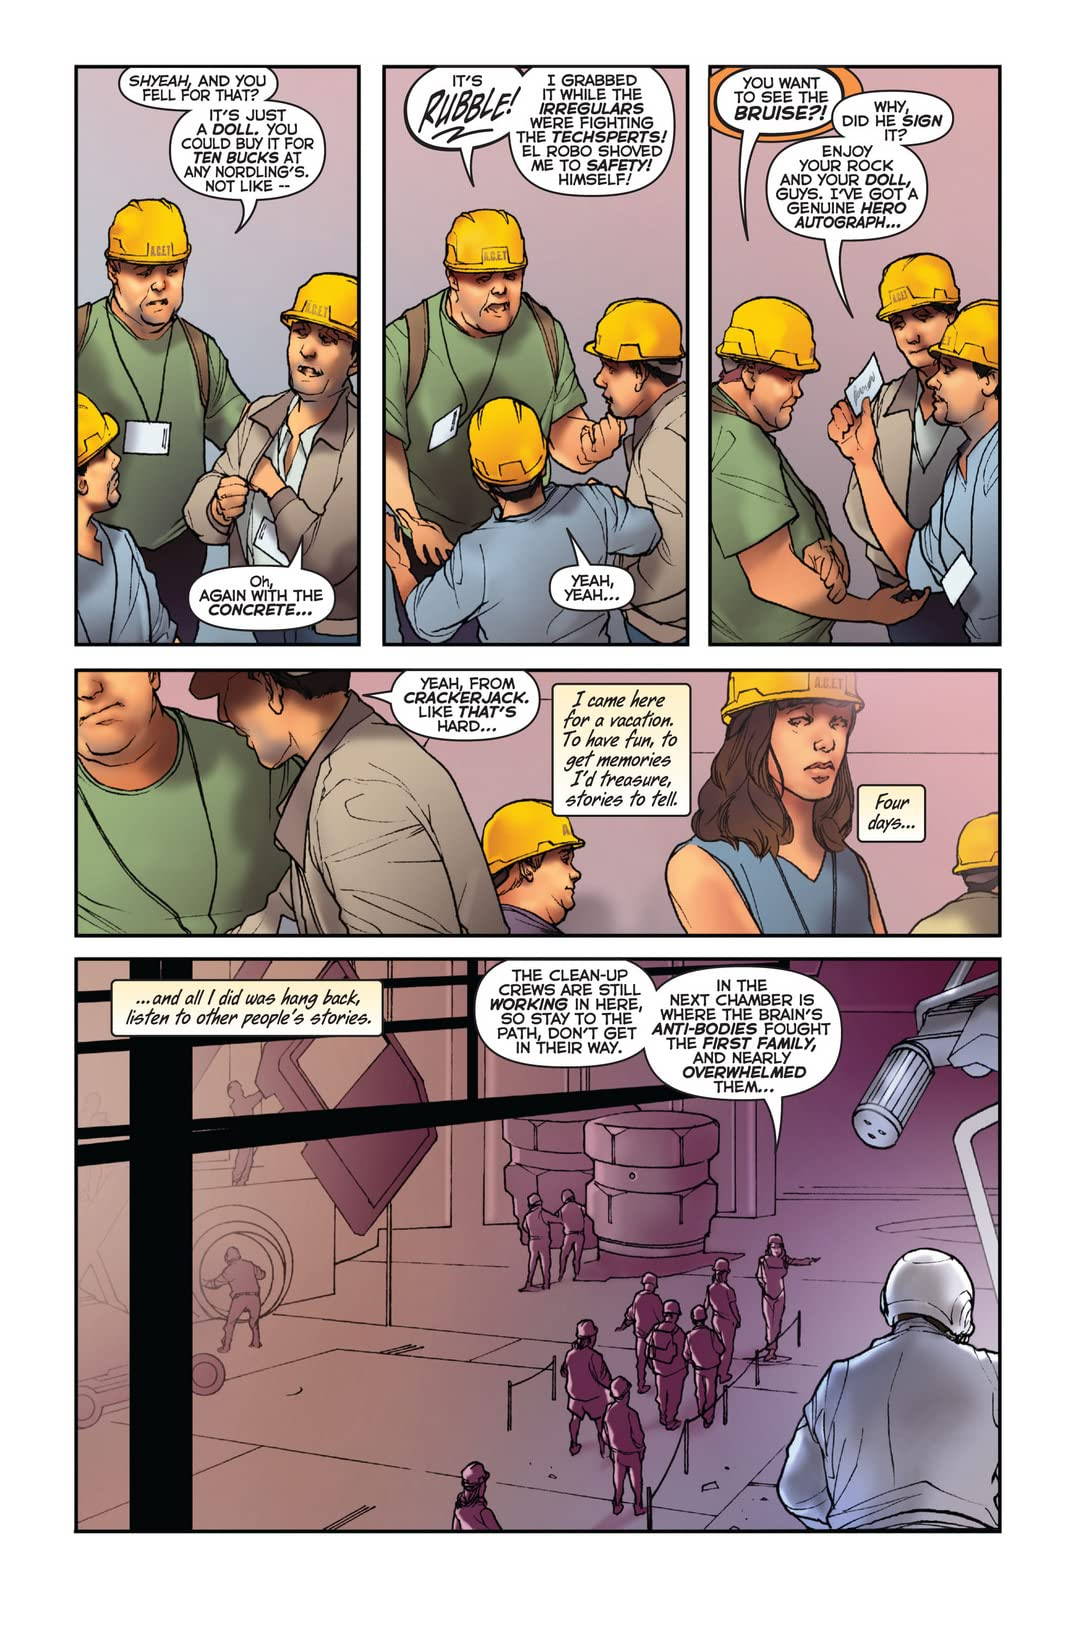 Astro City: A Visitor's Guide